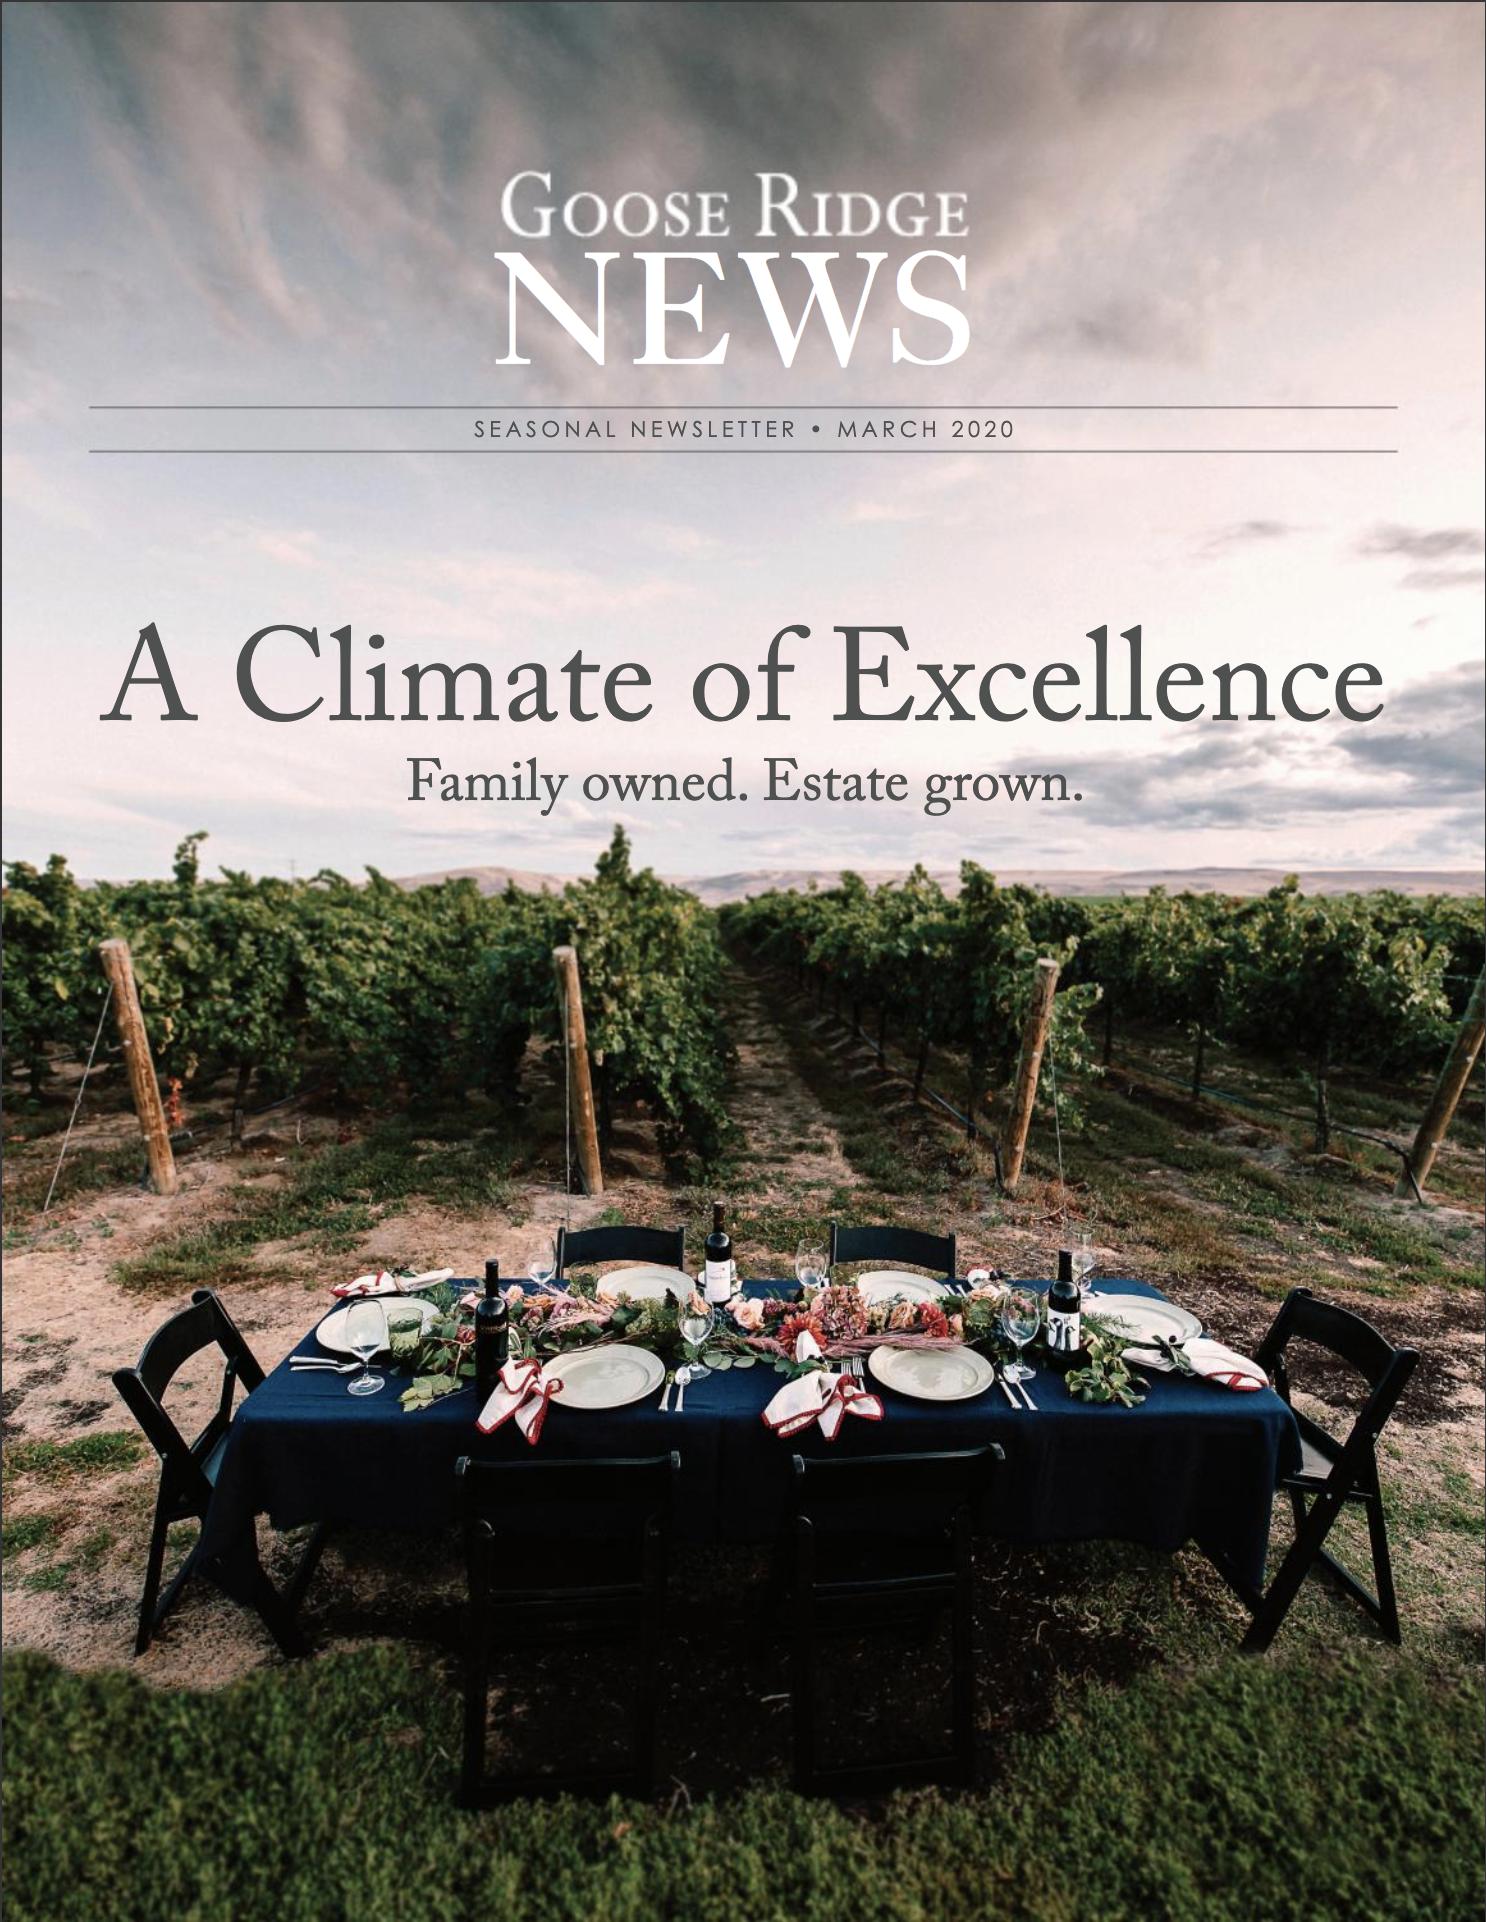 Goose Ridge News - Vol 1